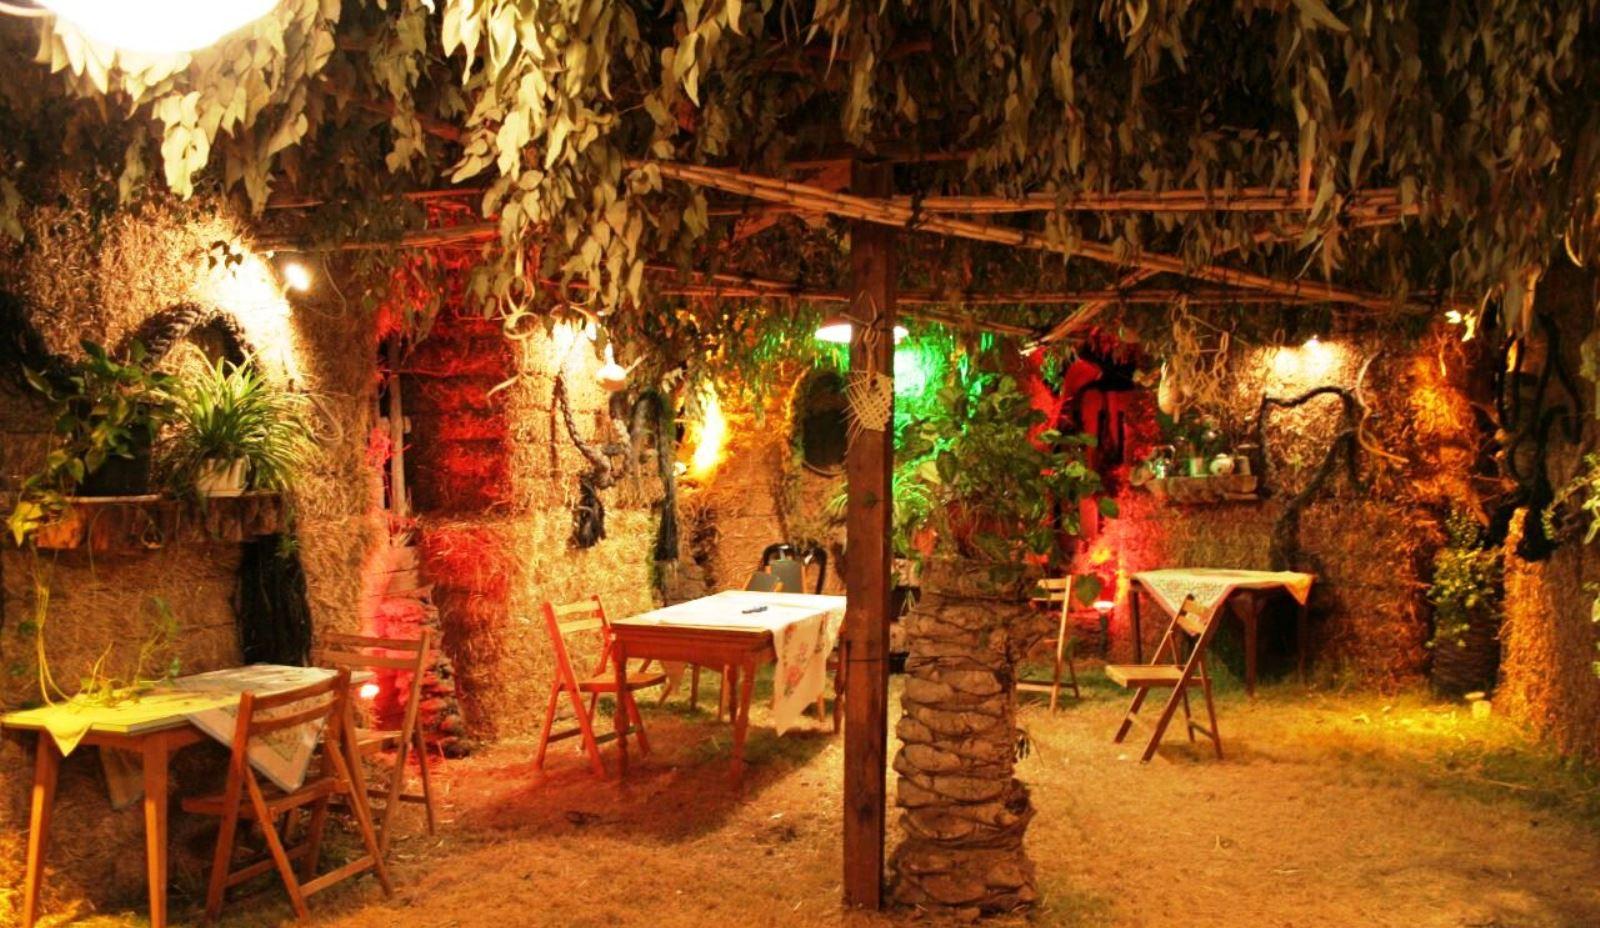 The award-winningstraw-bale sukkah at Kibbutz Tirat Zvi. Photo courtesy of the Tirat Zvi Archive